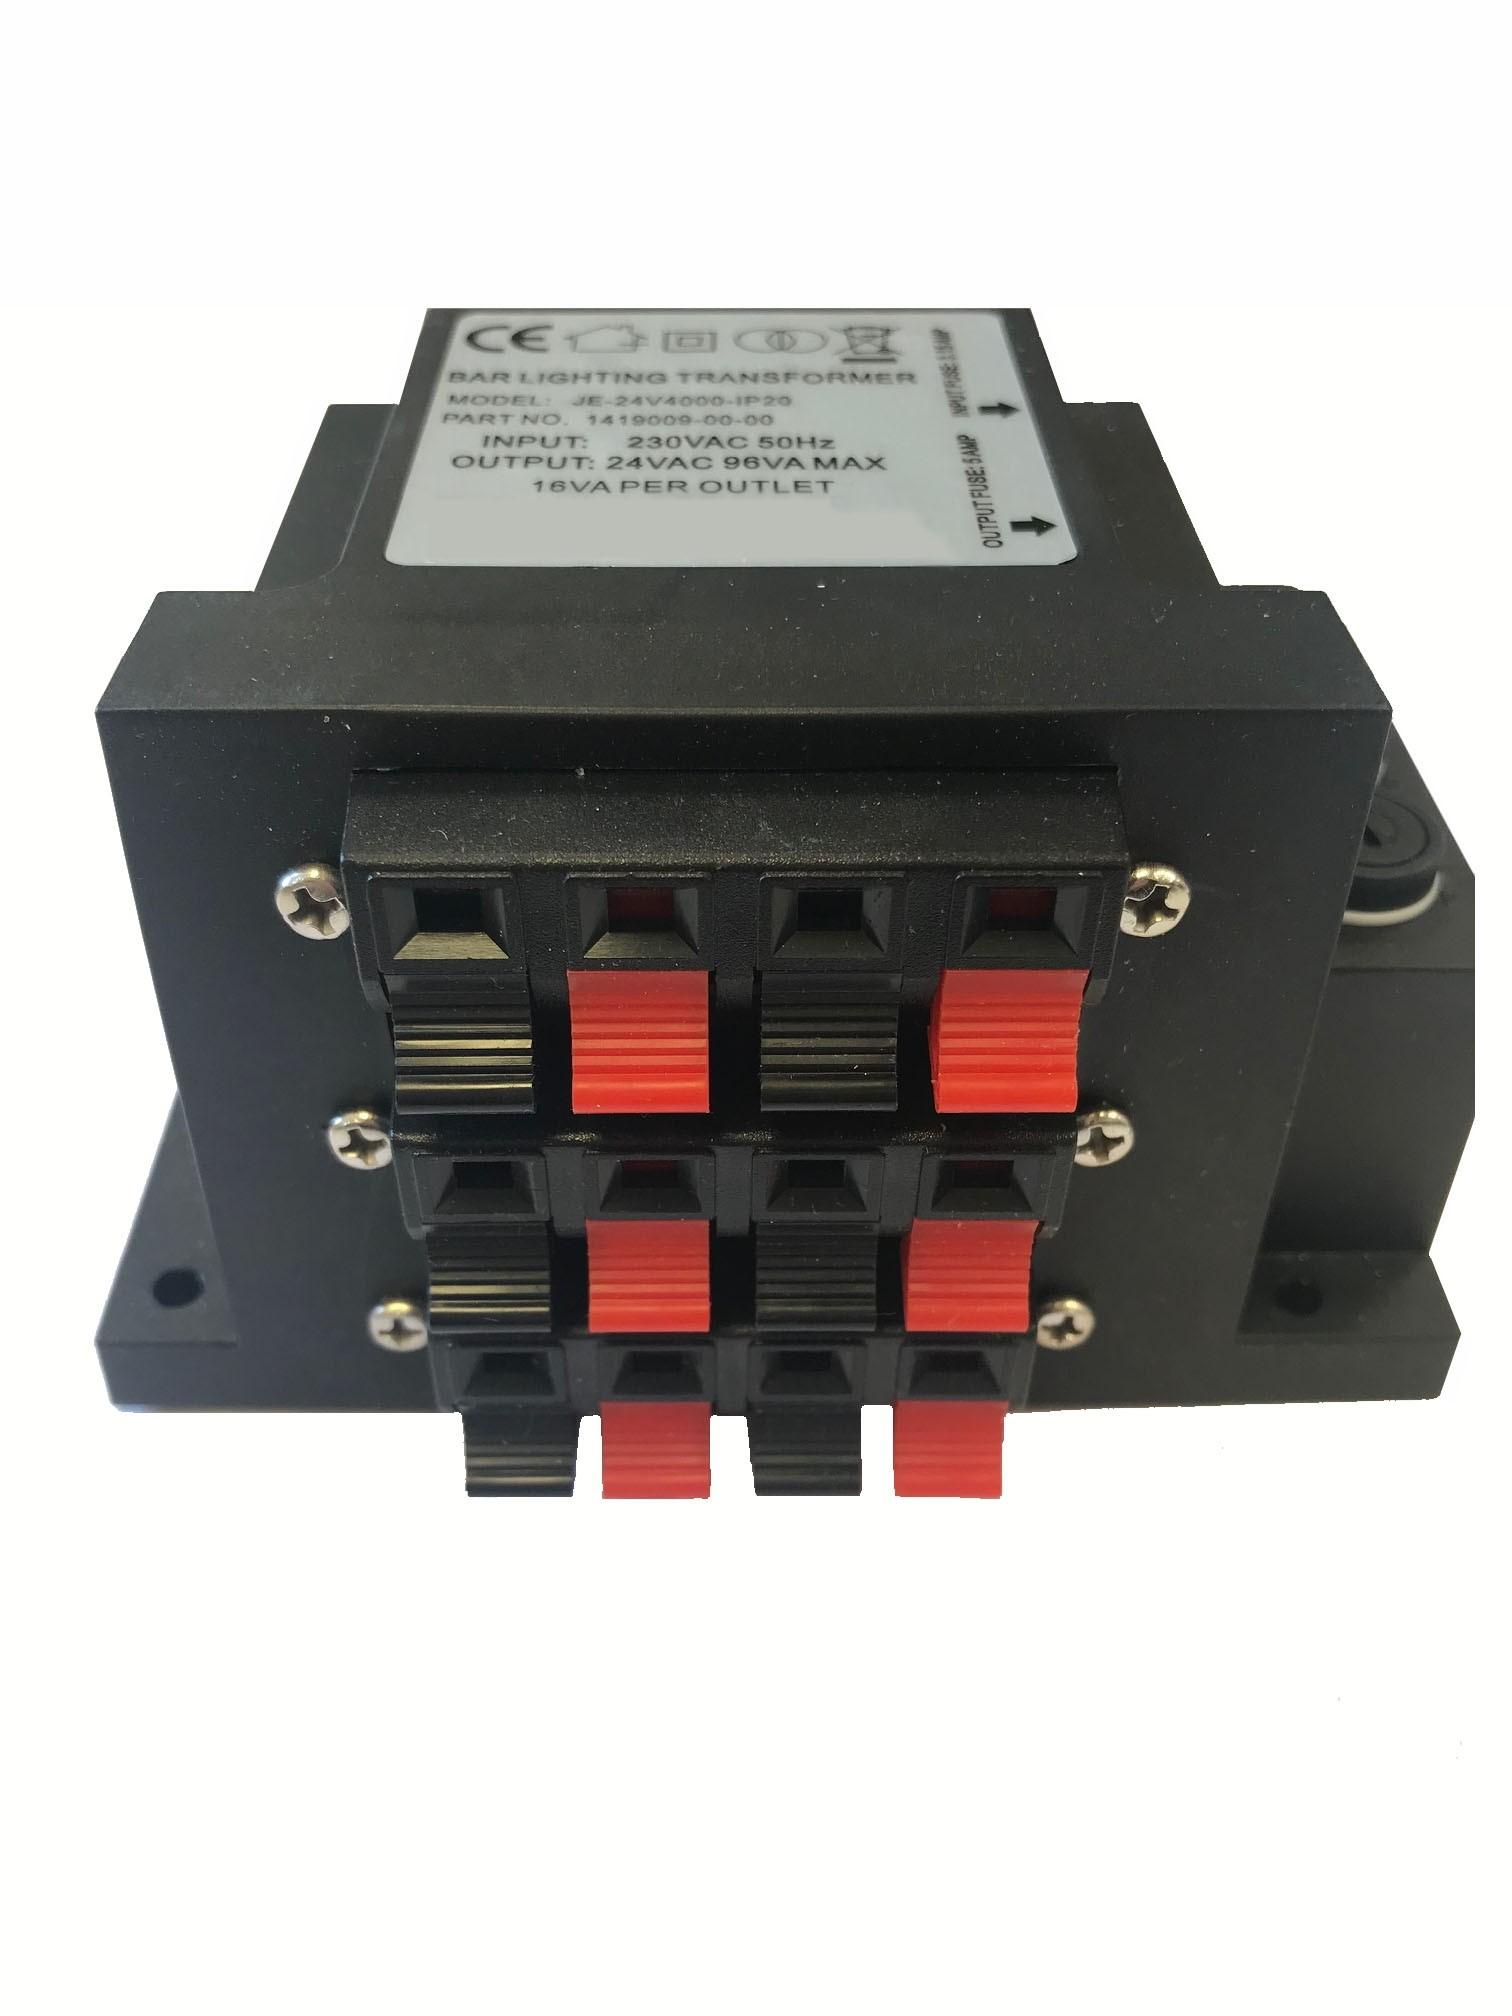 Bar Lighting Transformer 24v